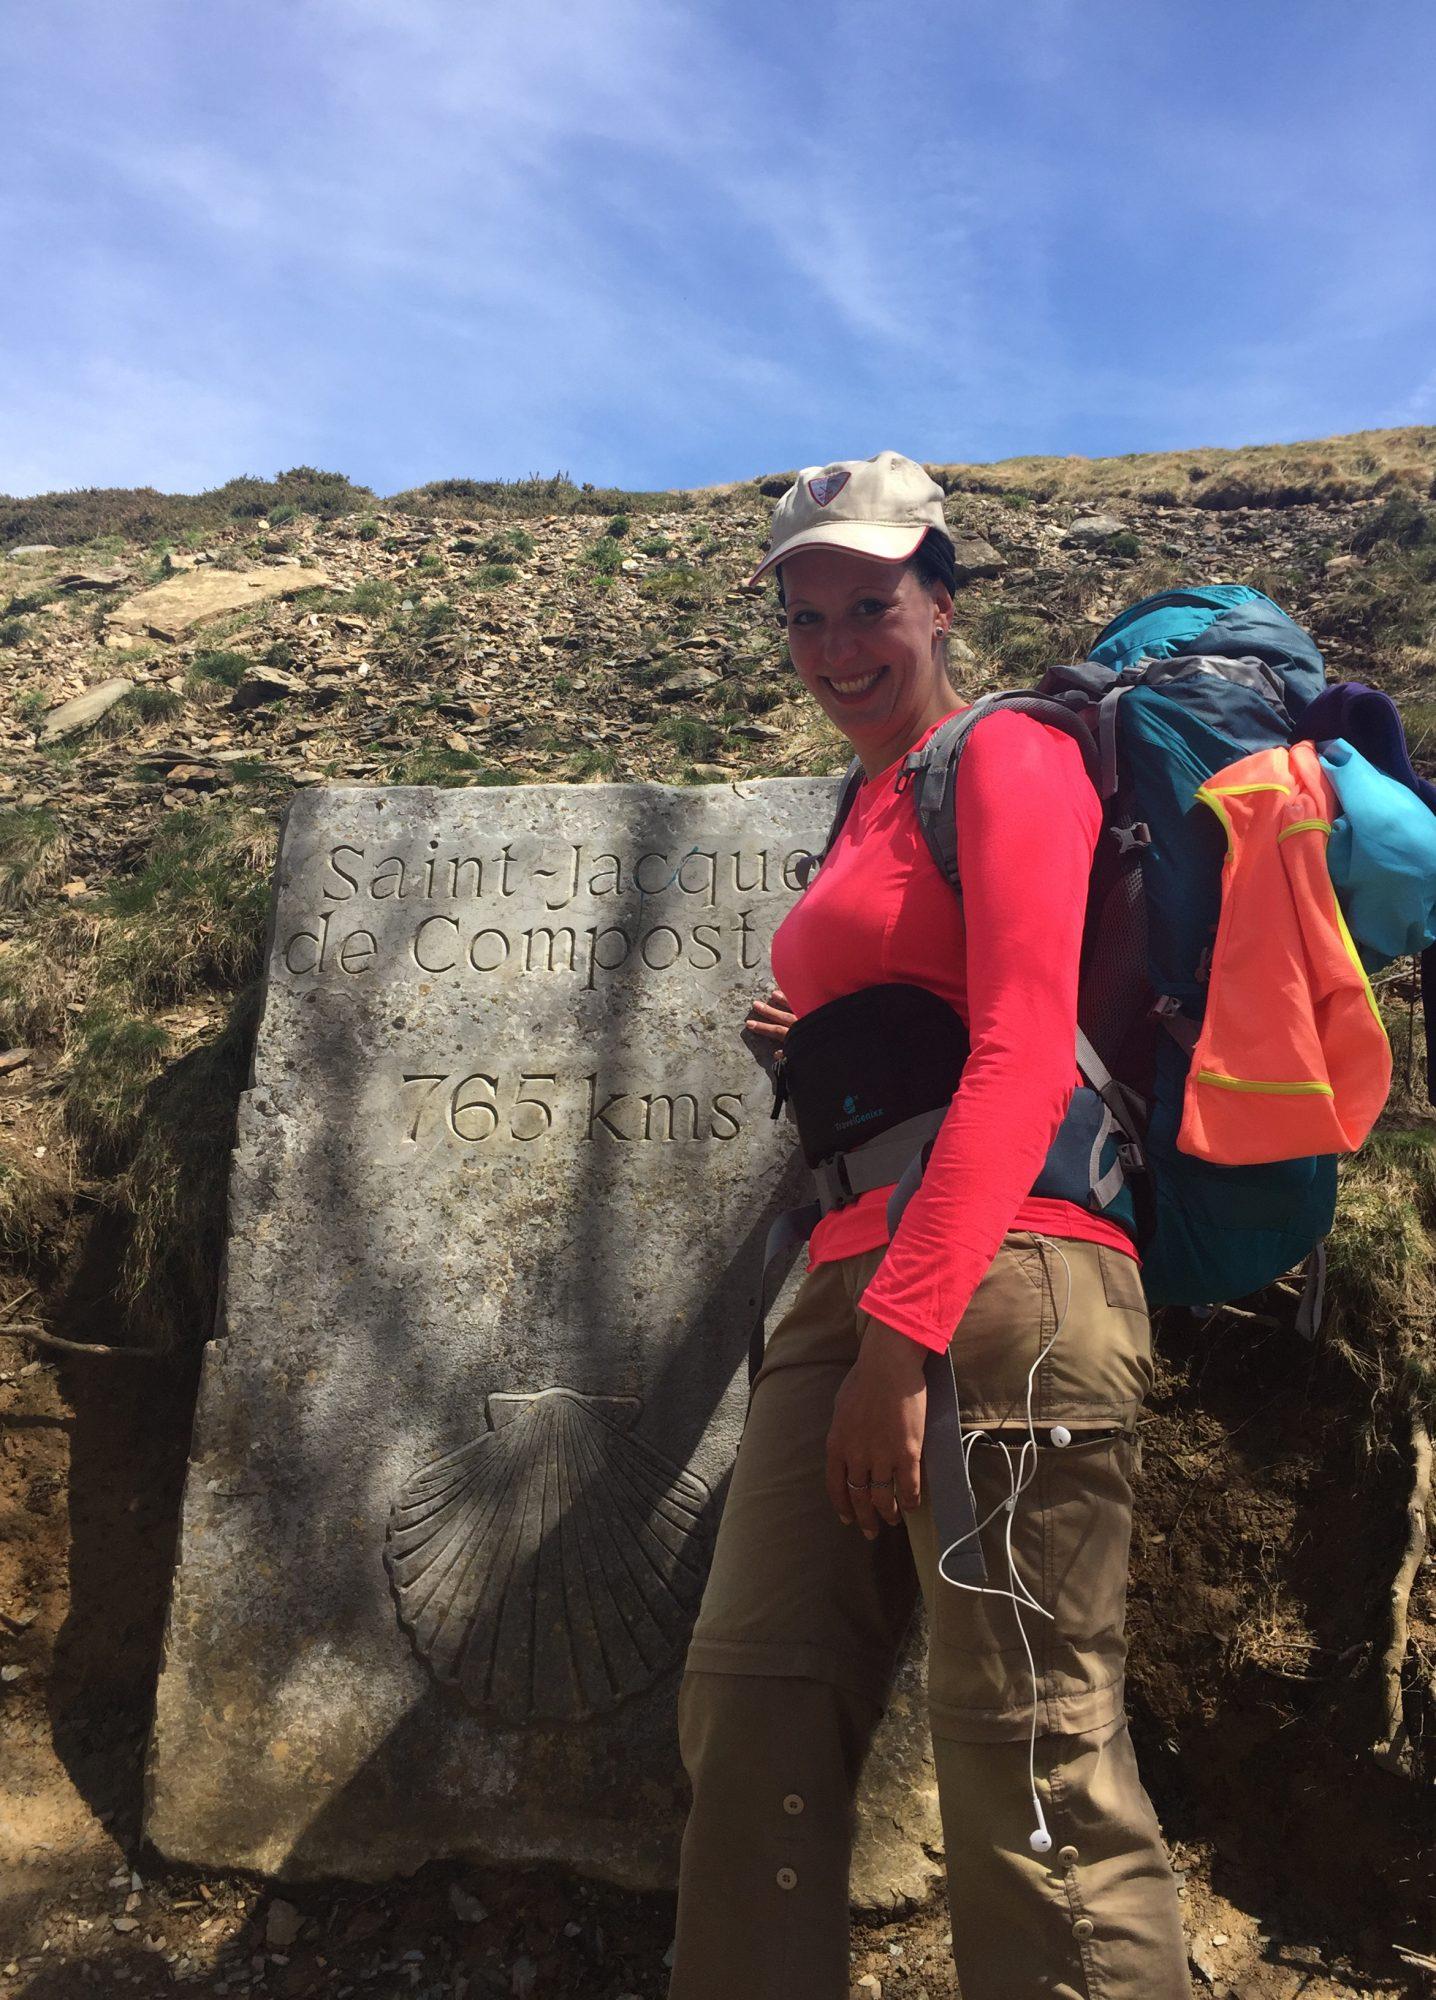 Ibaneta Pass, Camino Francés, Wandern, Wandertour, Pilgern, Jakobsweg, Pyrenäeen, Frankreich, Spanien